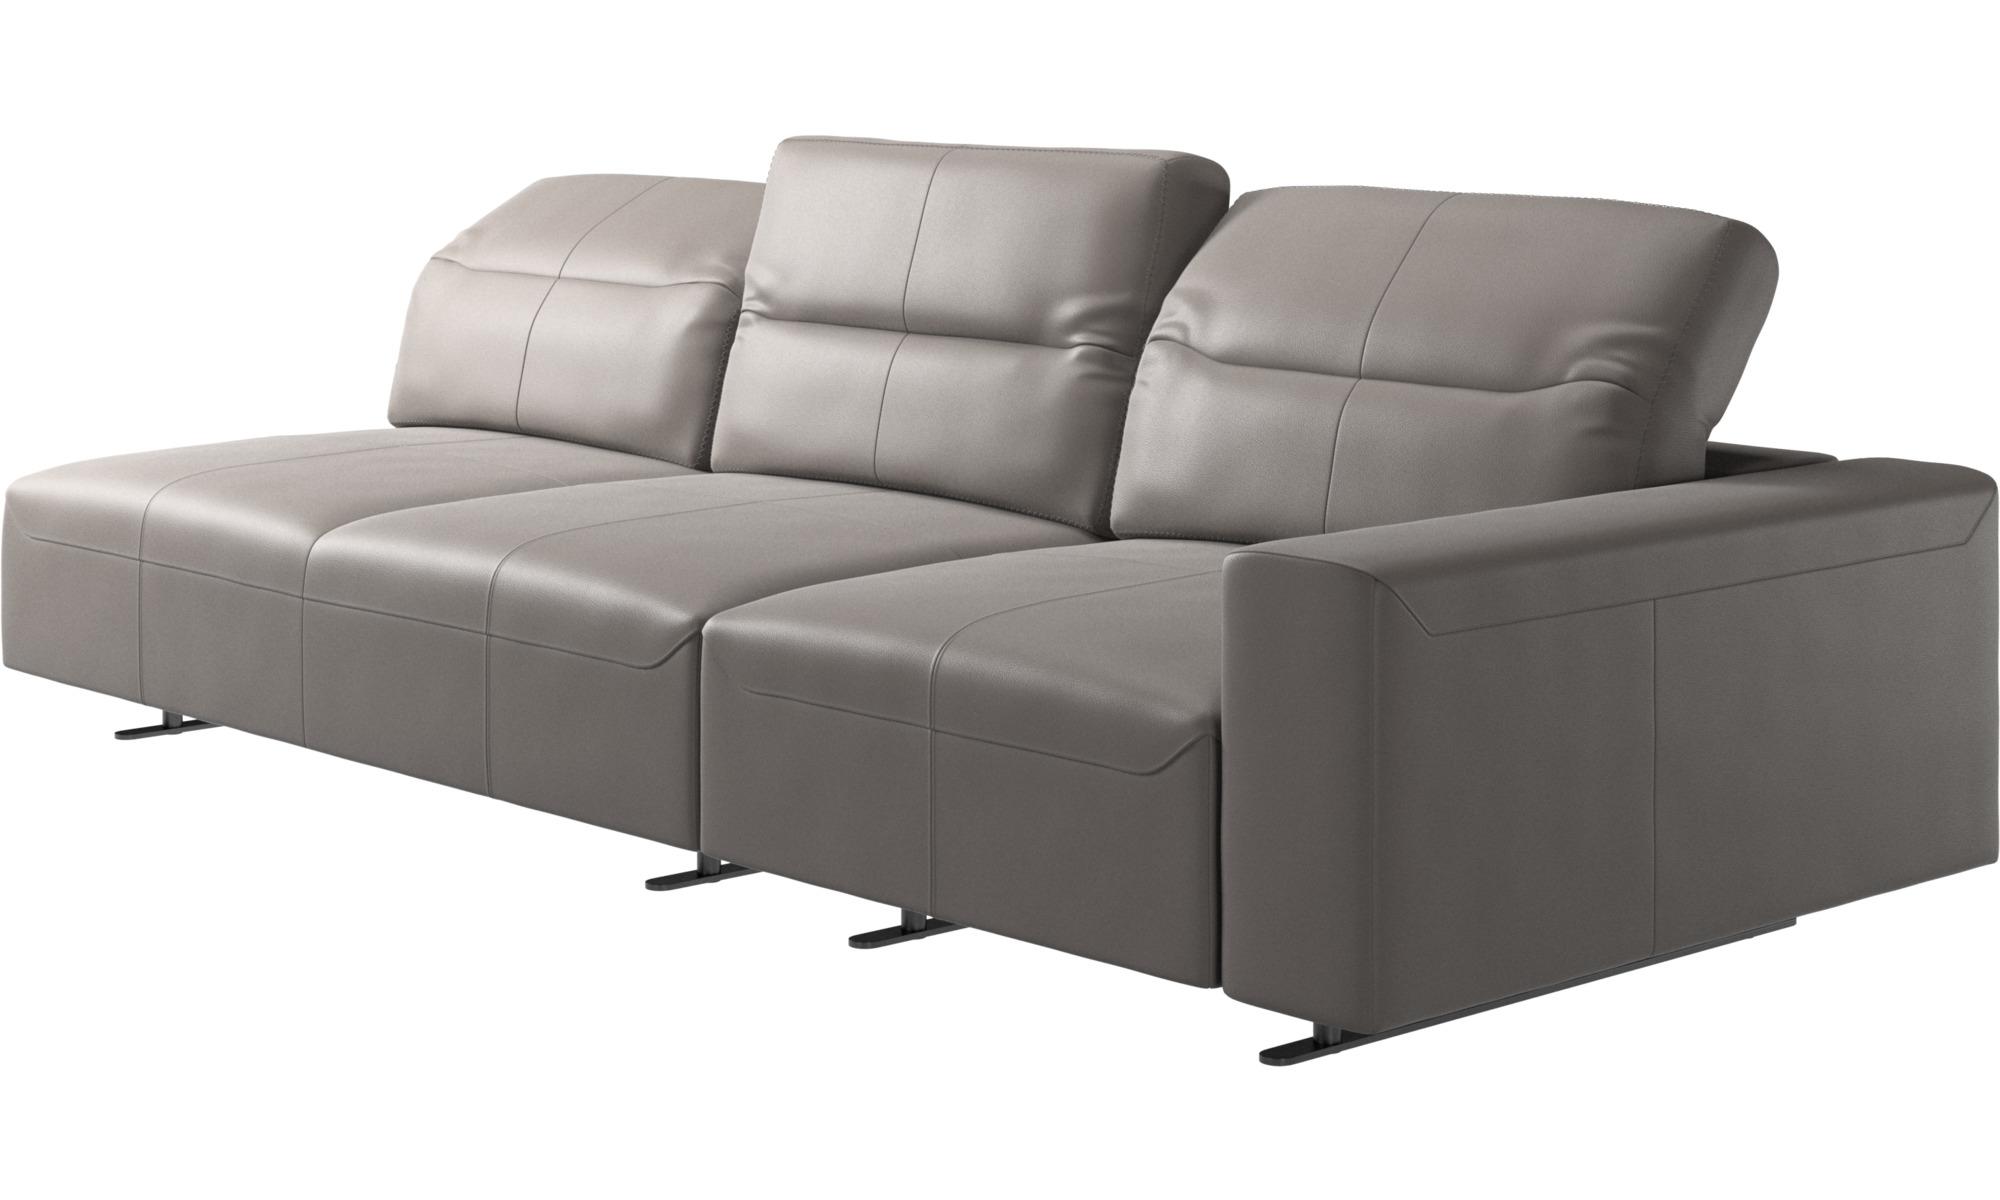 3 sitzer sofas hampton sofa mit verstellbarer. Black Bedroom Furniture Sets. Home Design Ideas